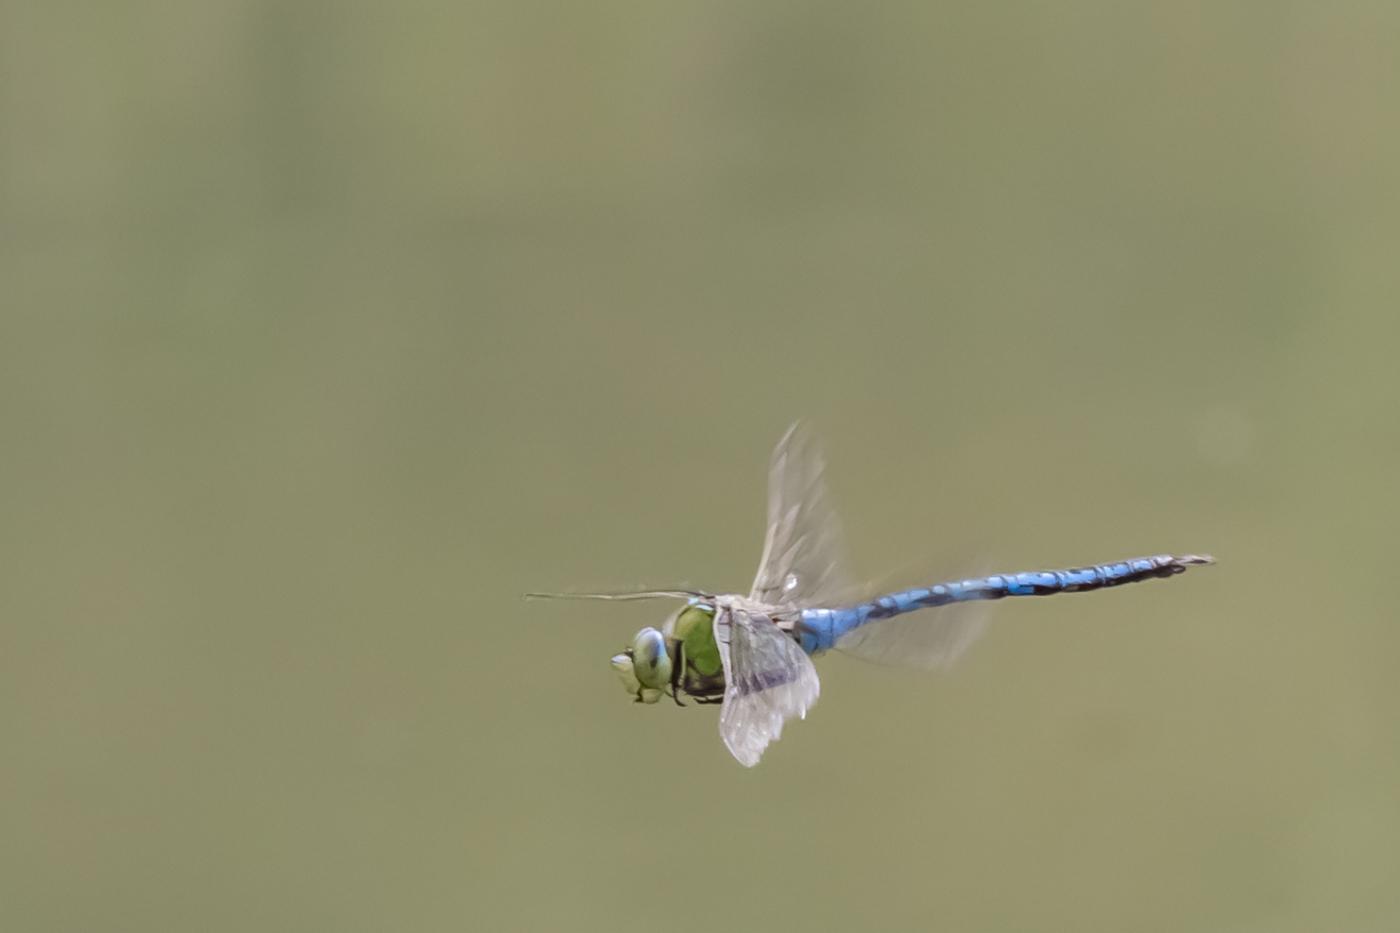 Emperor Dragonfly, Stonepit Field, 15Jul14, Peter Hassett